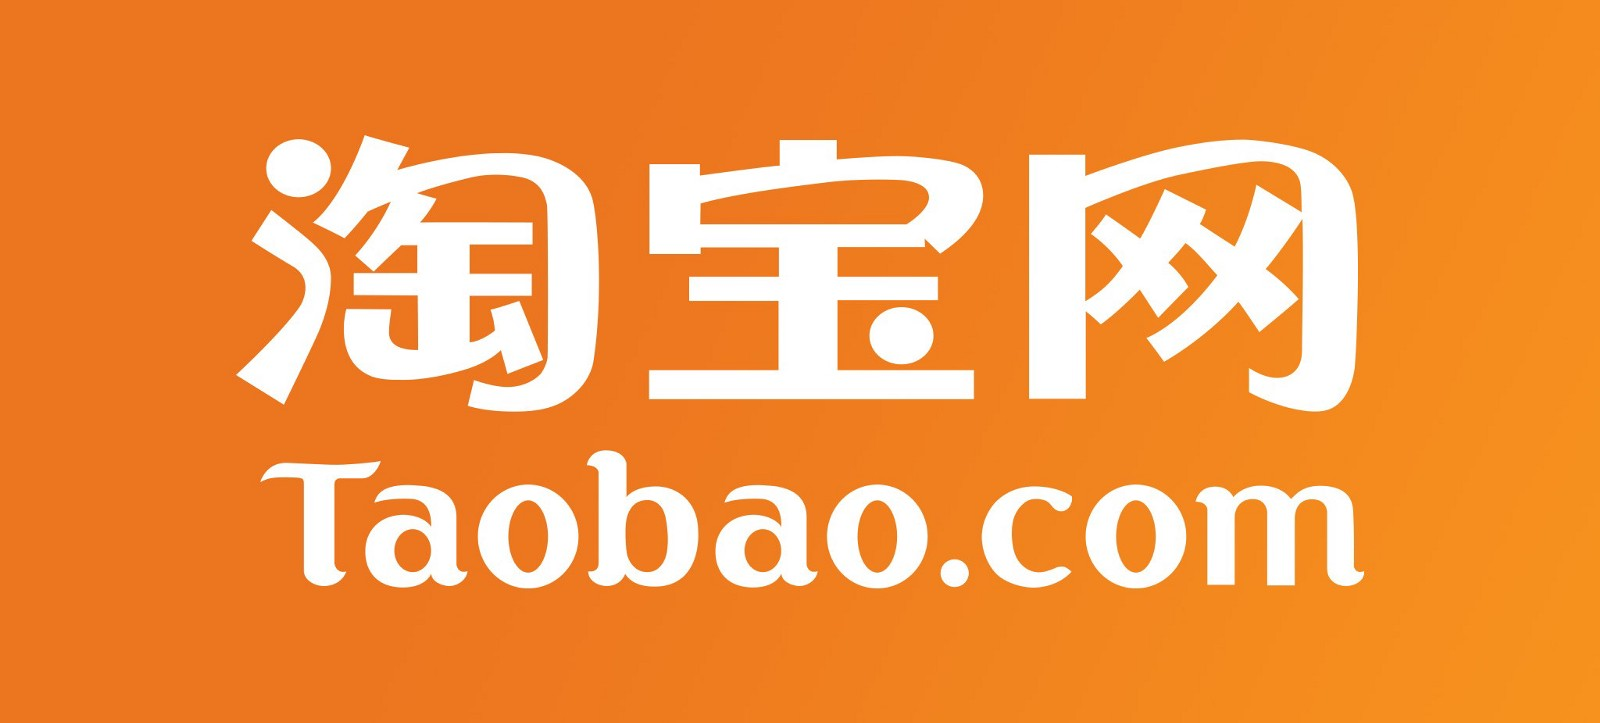 Taobao Marketplace – HackerNoon.com